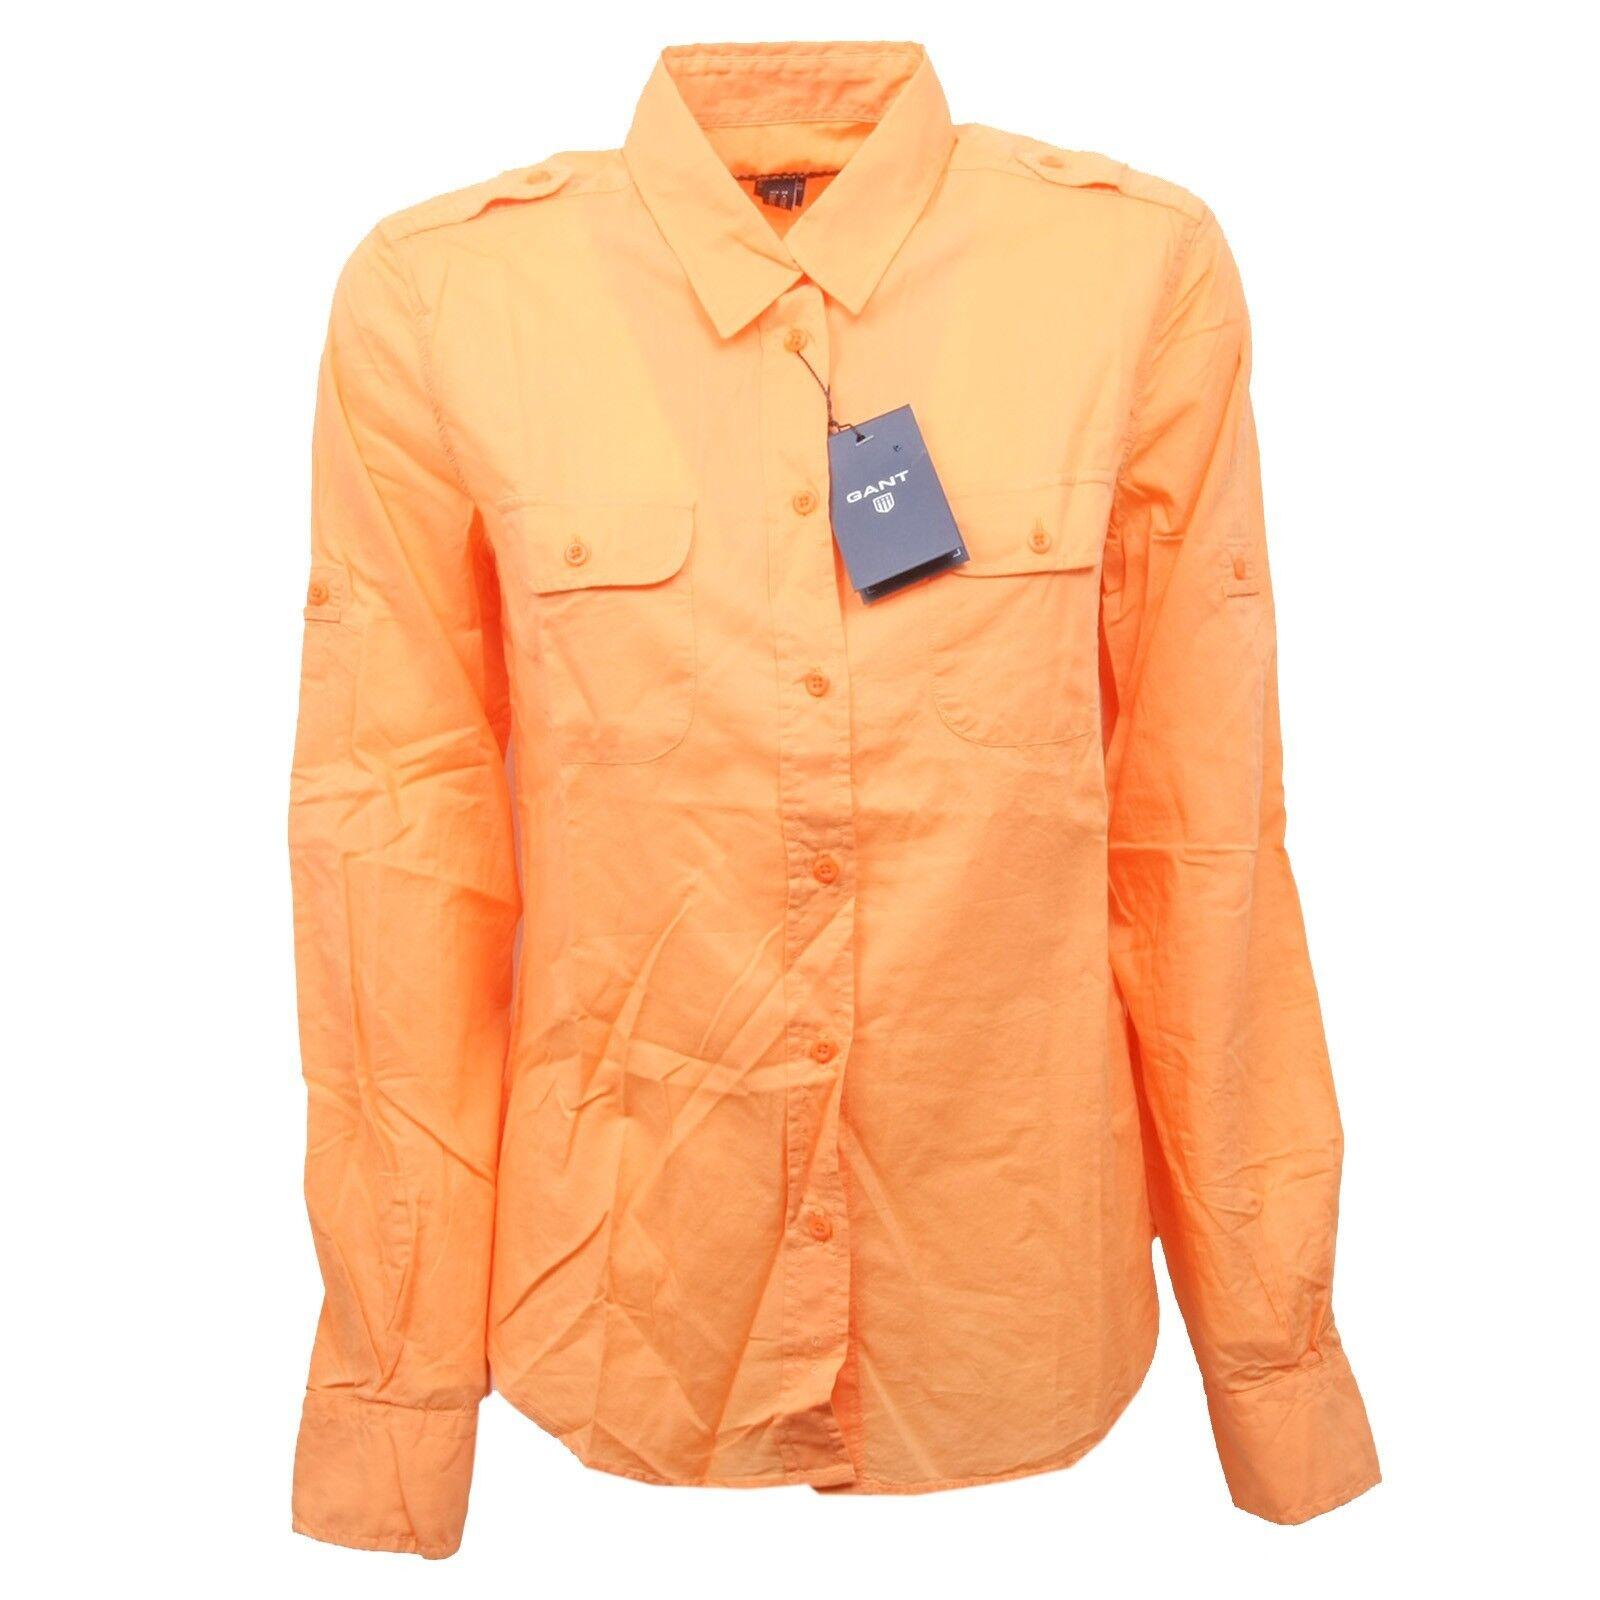 B8074 camicia manica lunga donna GANT arancione shirt Donna